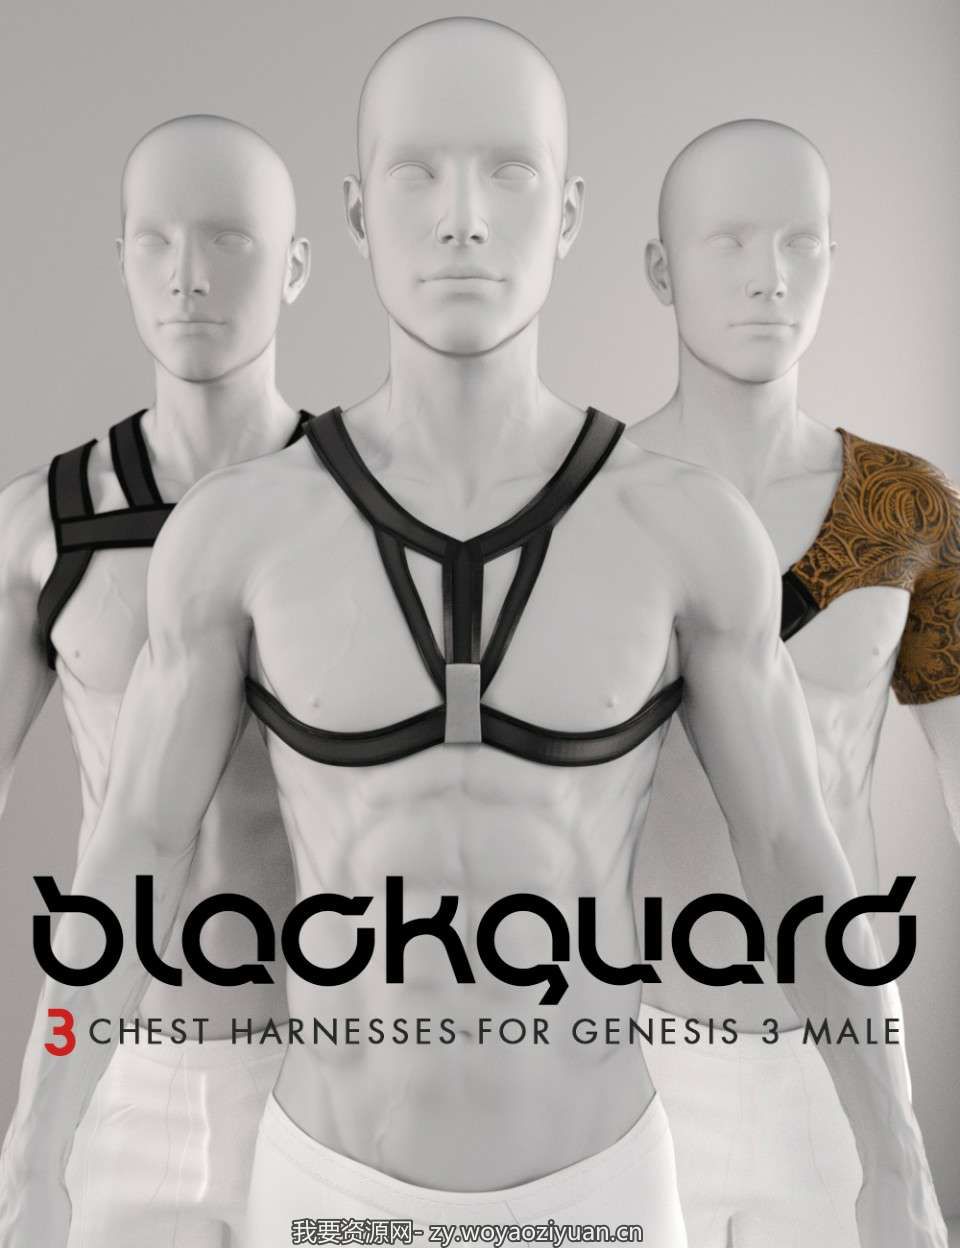 Shimuzu's Blackguard 3 Harnesses for Genesis 3 Male